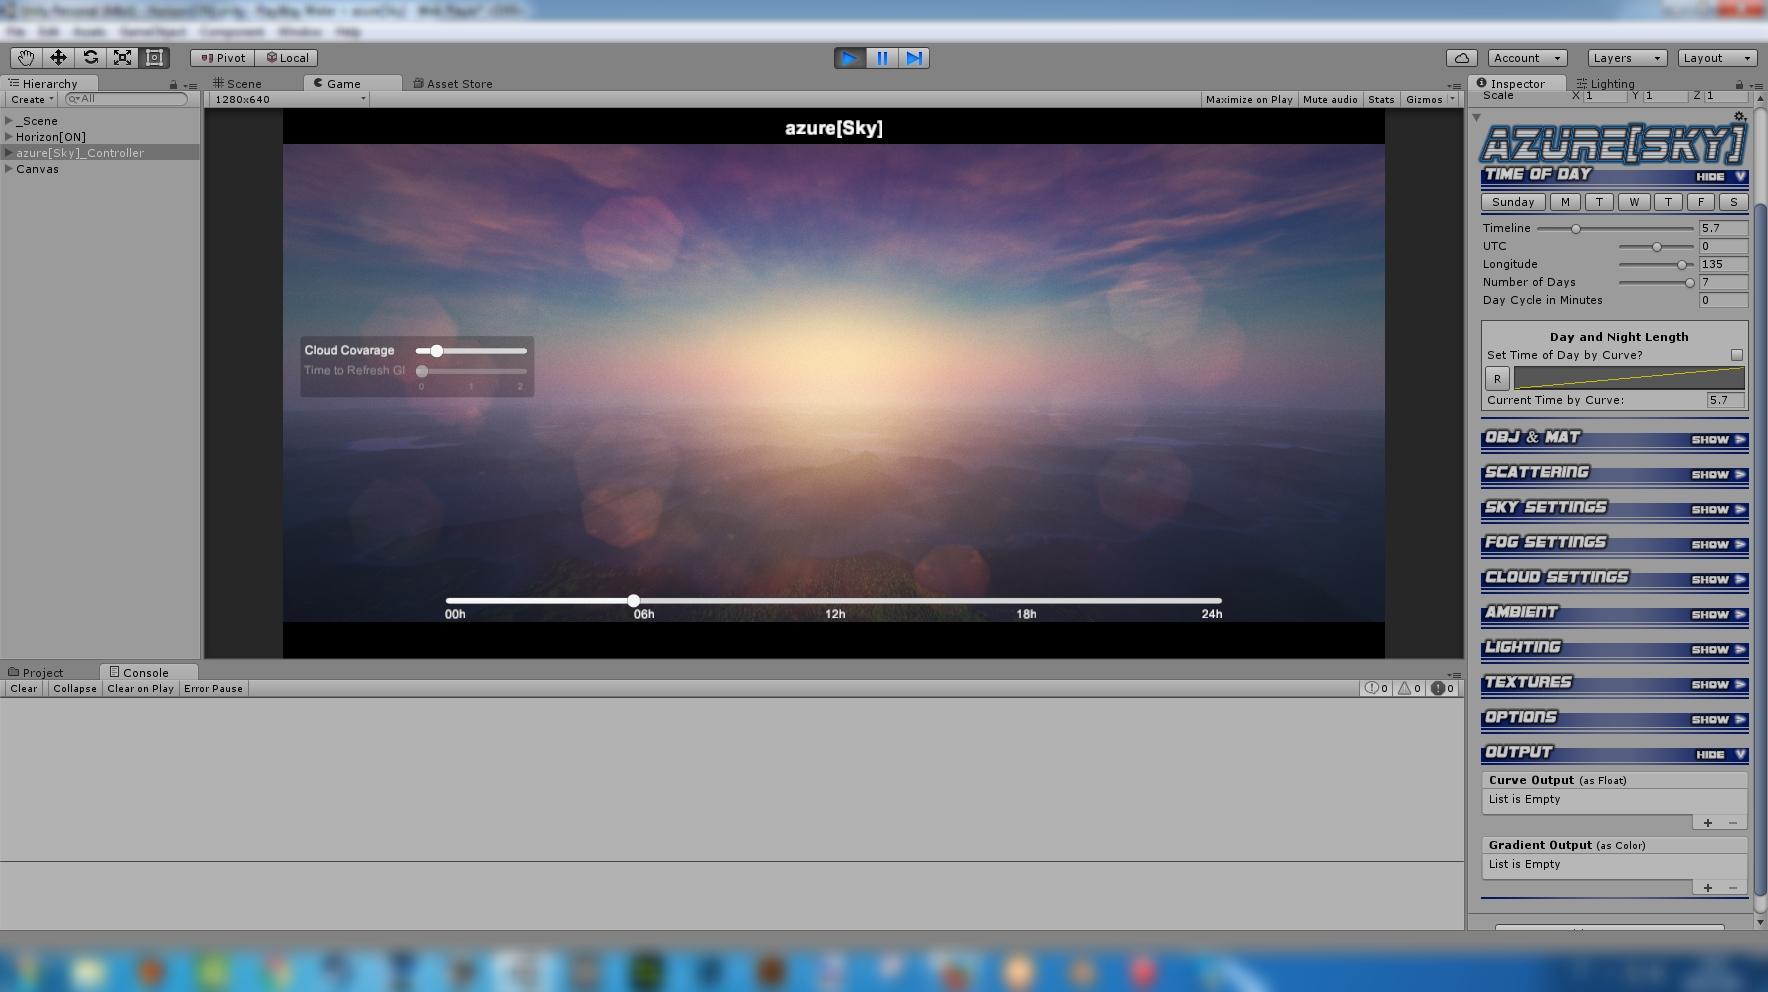 OriginalScreen.jpg